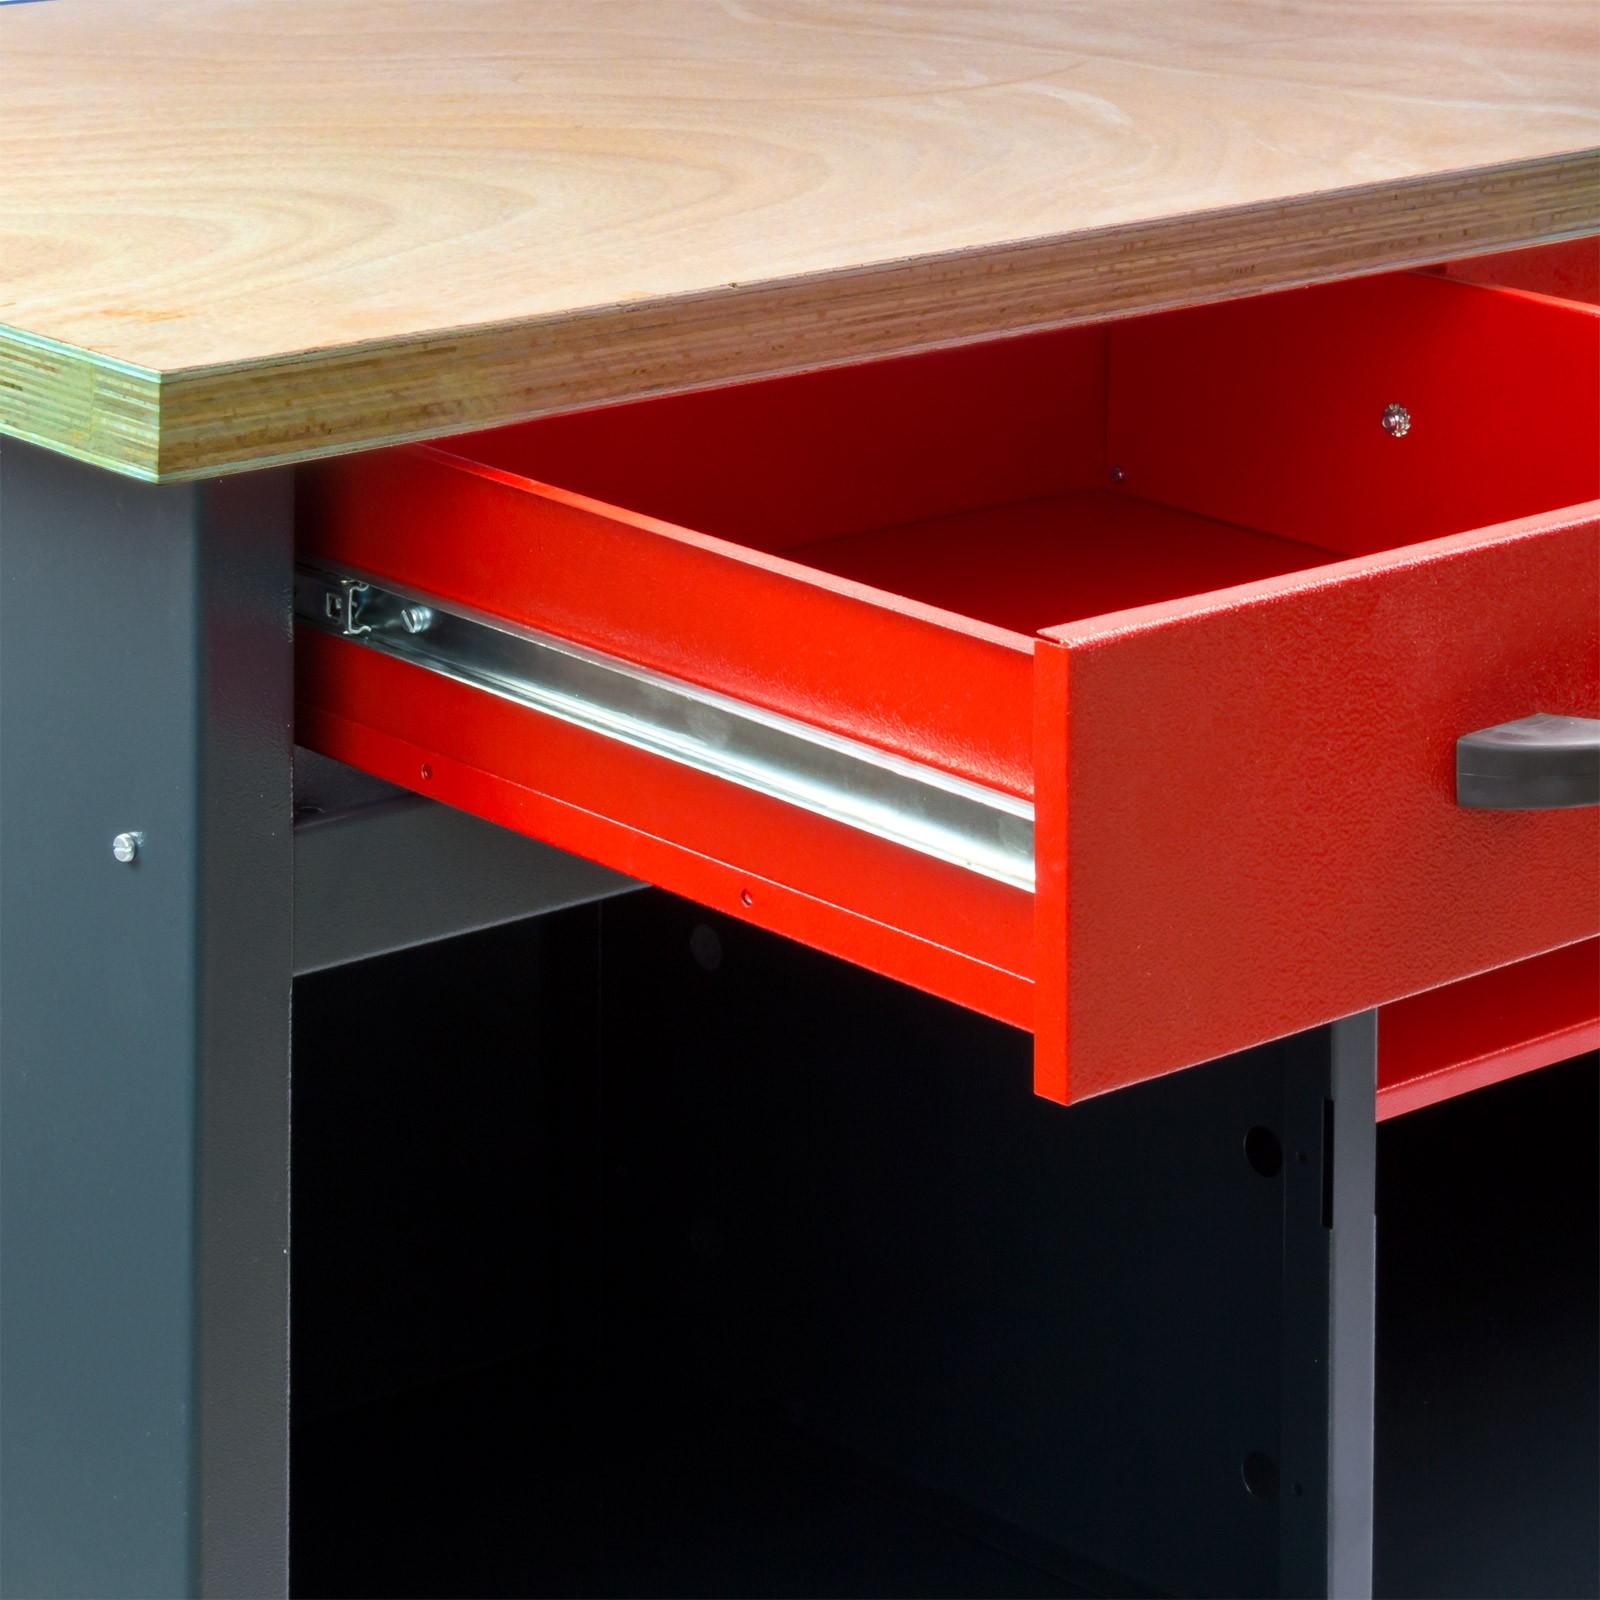 kleine werkbank g nstig kaufen im sk tools shop. Black Bedroom Furniture Sets. Home Design Ideas